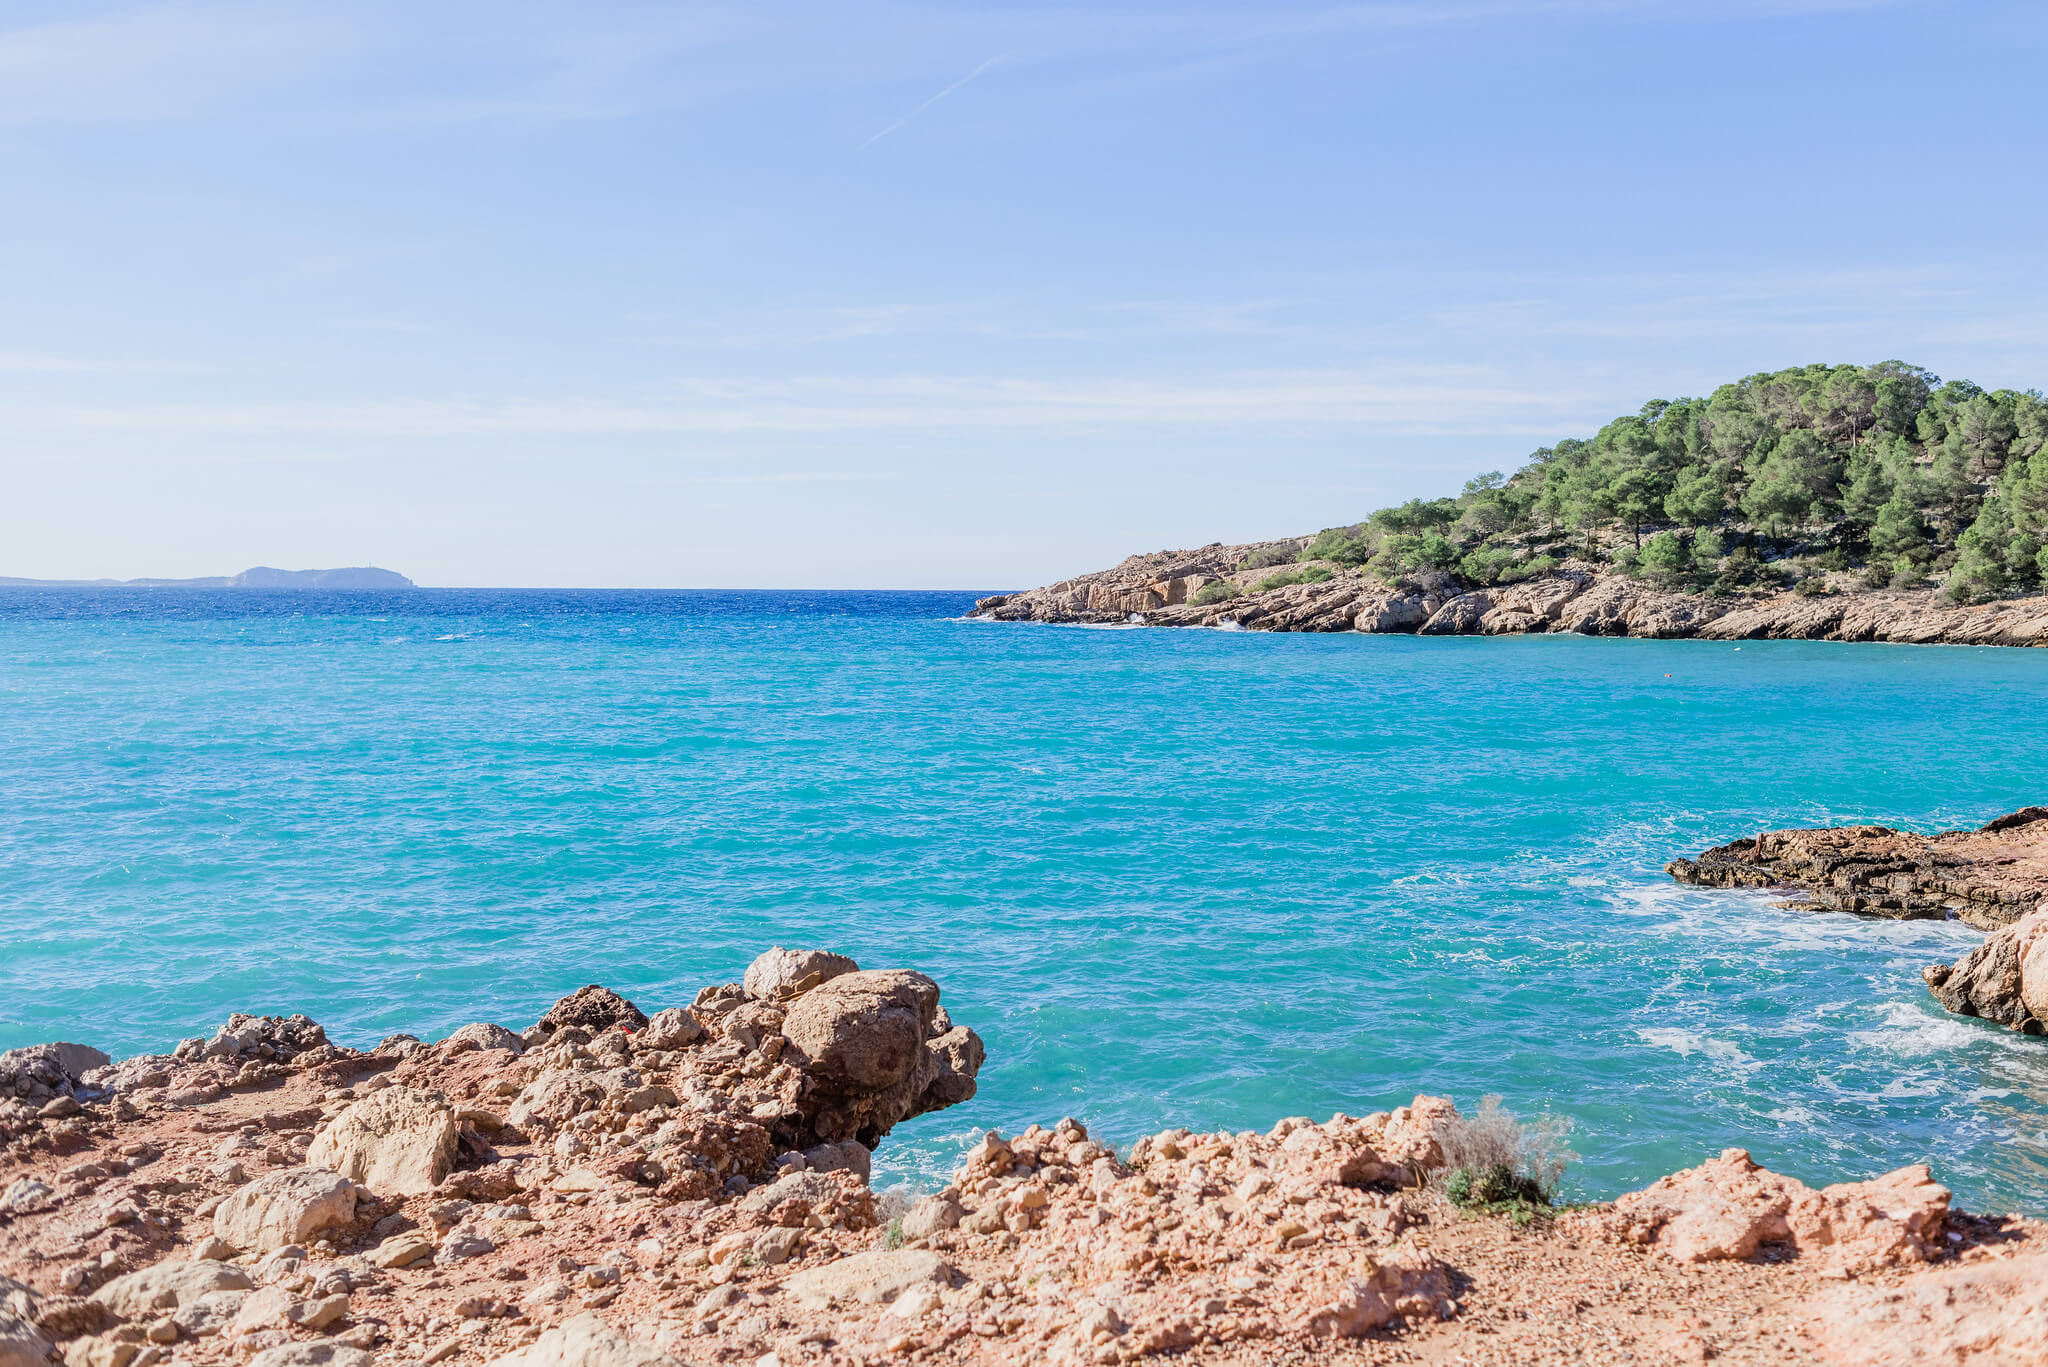 https://www.white-ibiza.com/wp-content/uploads/2020/03/ibiza-beaches-cala-salada-04.jpg